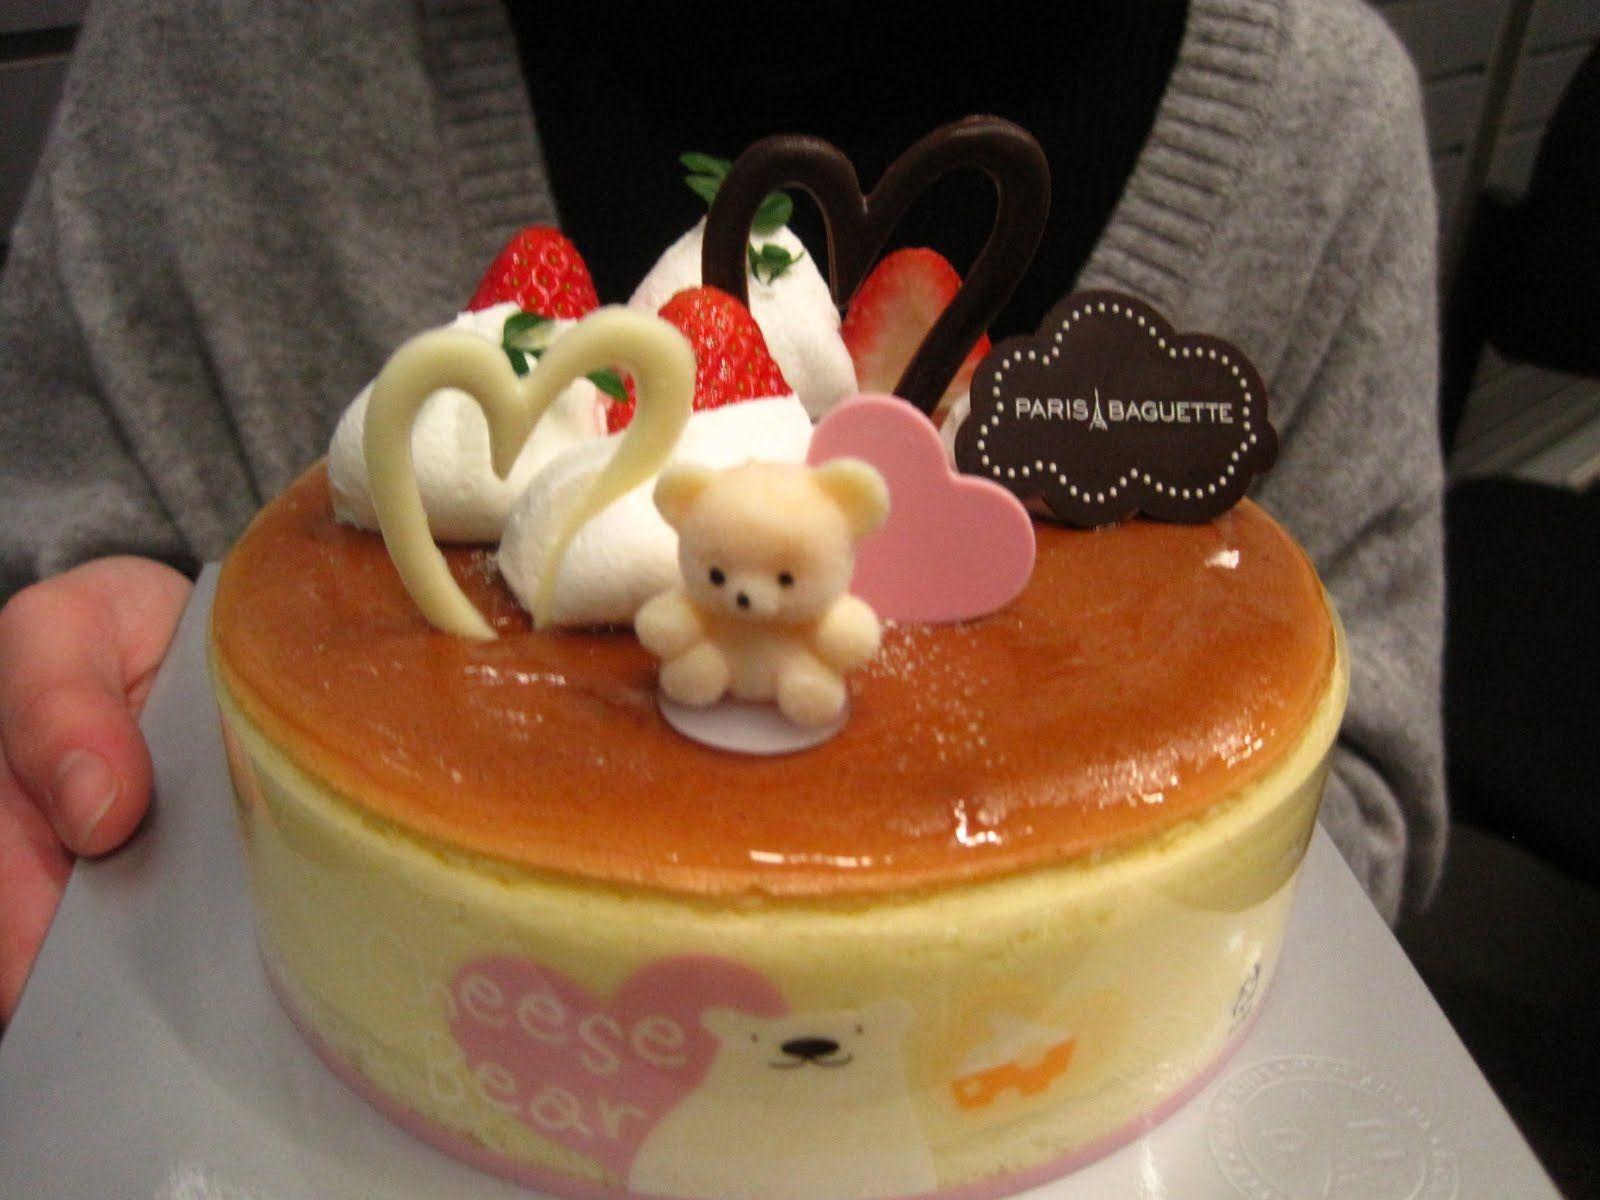 Korean Kumara Cake Recipe: Korean Cakes - Awww...Cute!!!